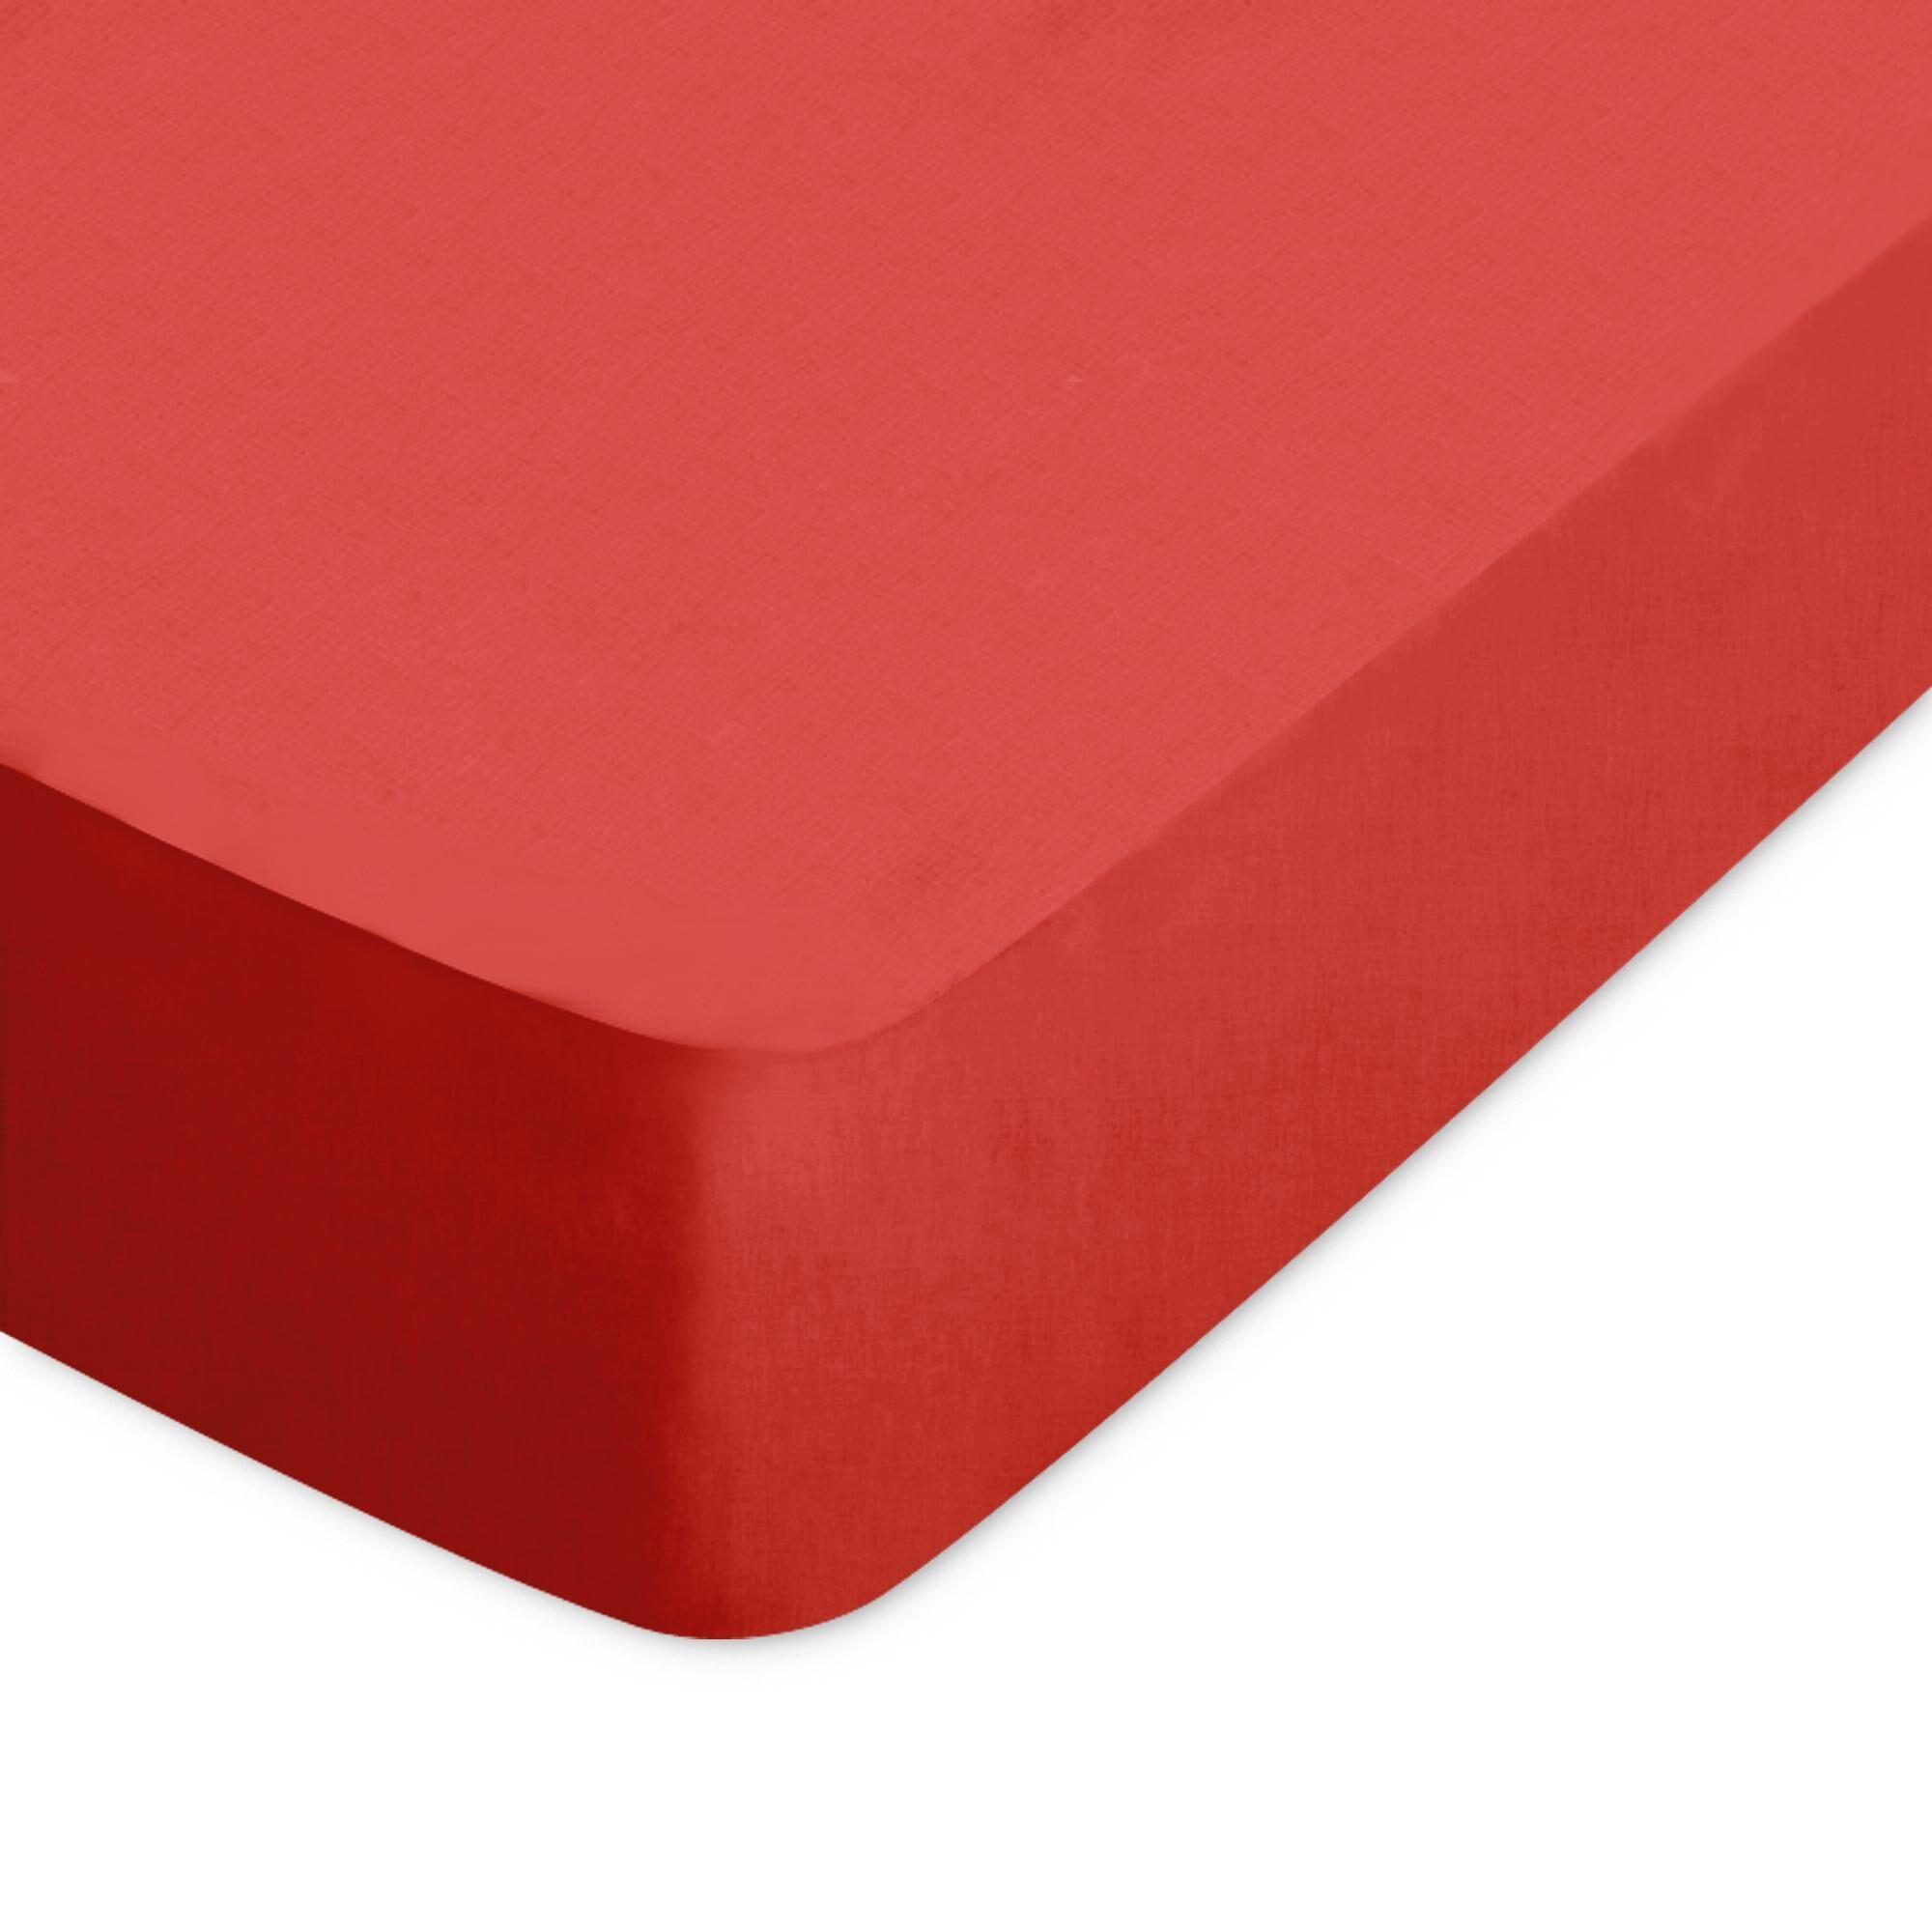 Linnea Drap housse uni 190x190 cm 100% coton ALTO orange Baie de Goji